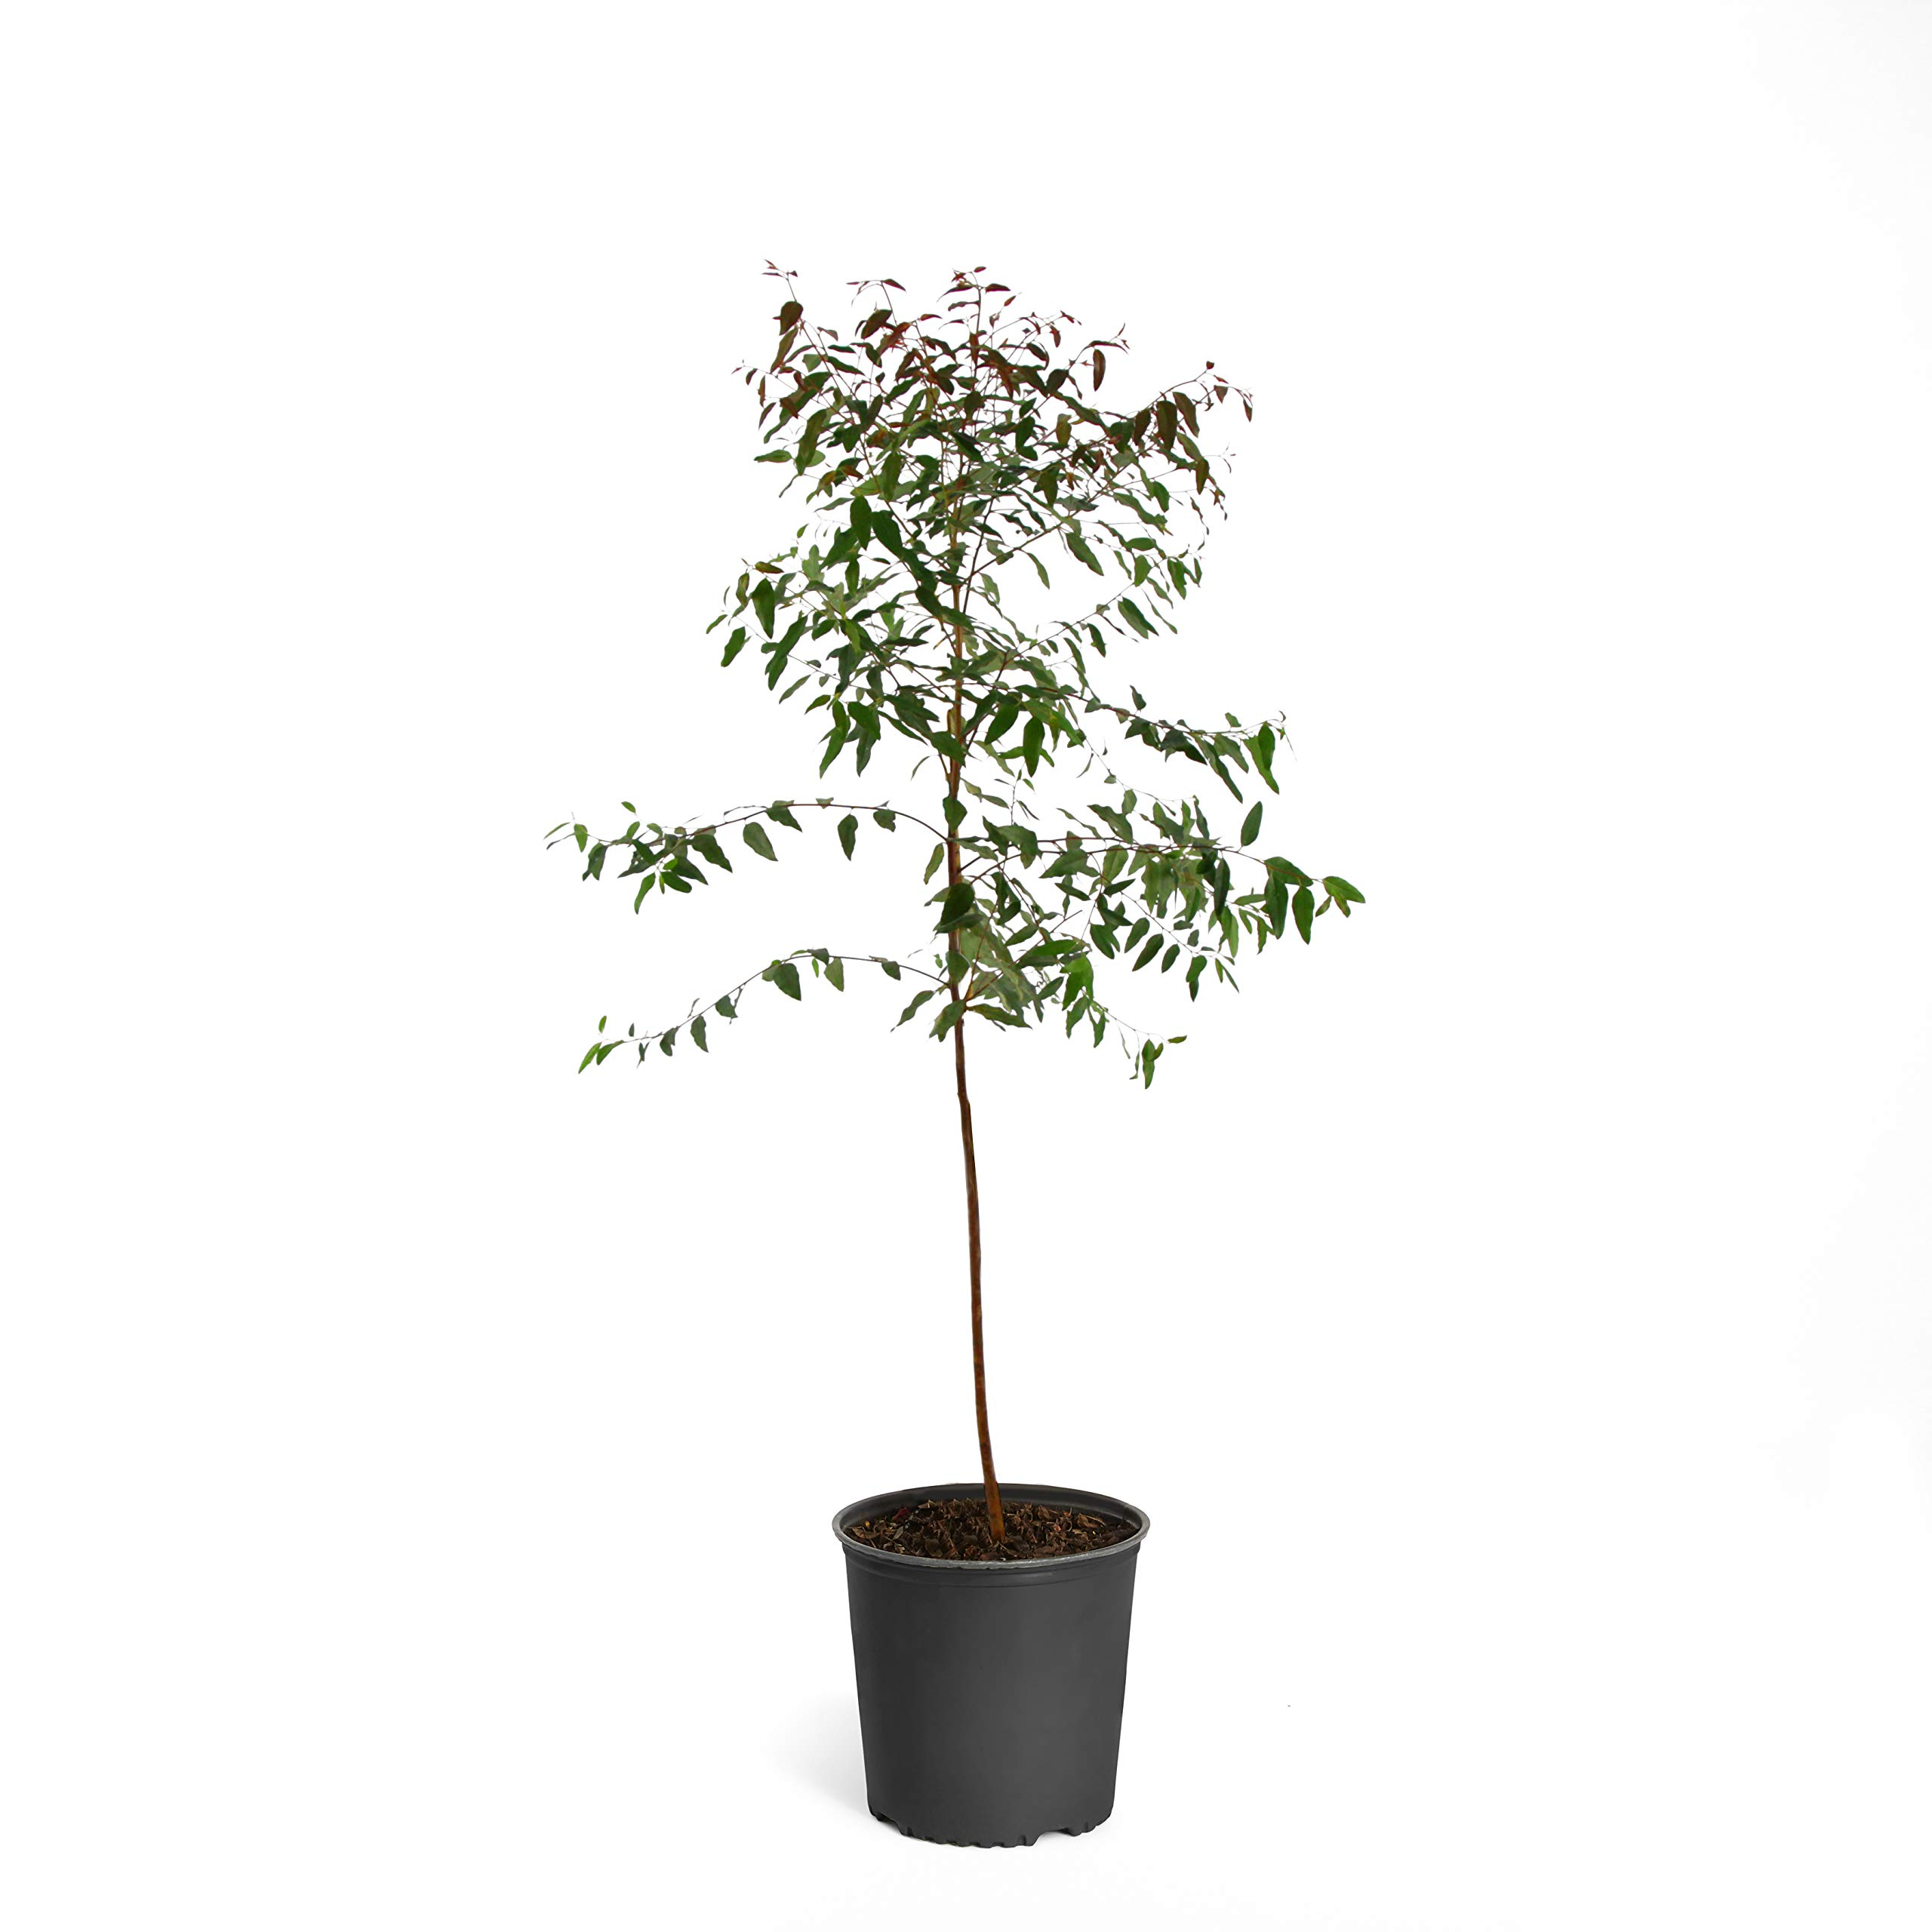 Rainbow Eucalyptus - 2-3 ft. | No Shipping to AZ